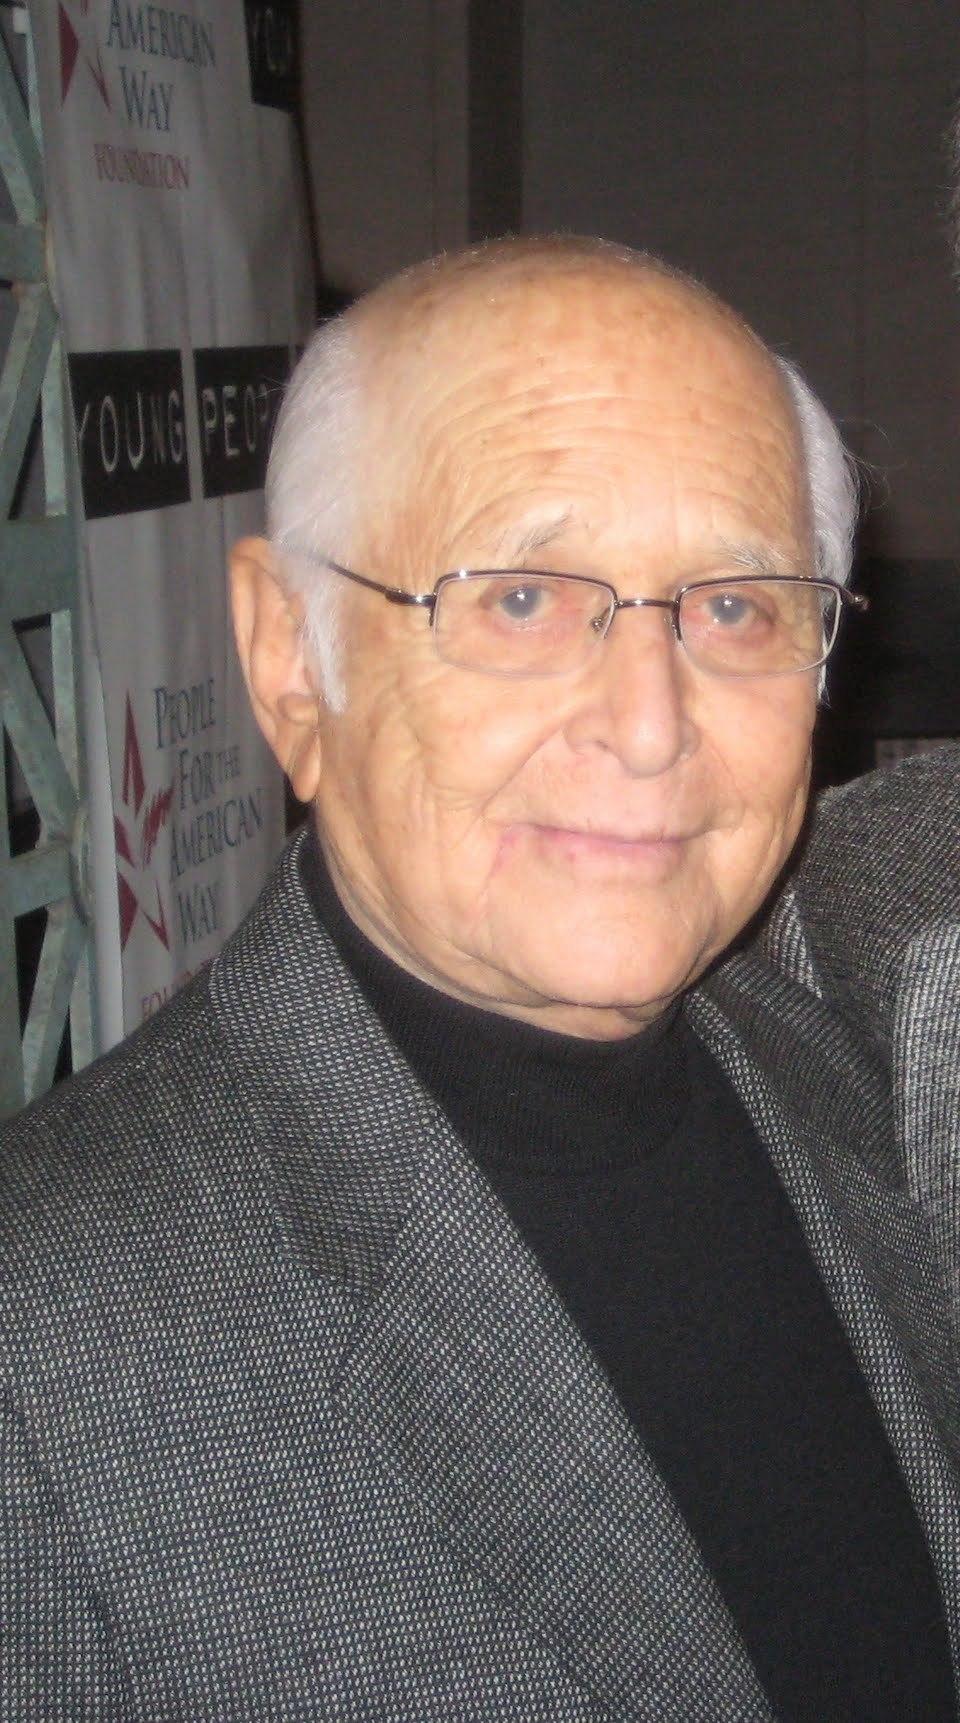 Norman Lear Net Worth